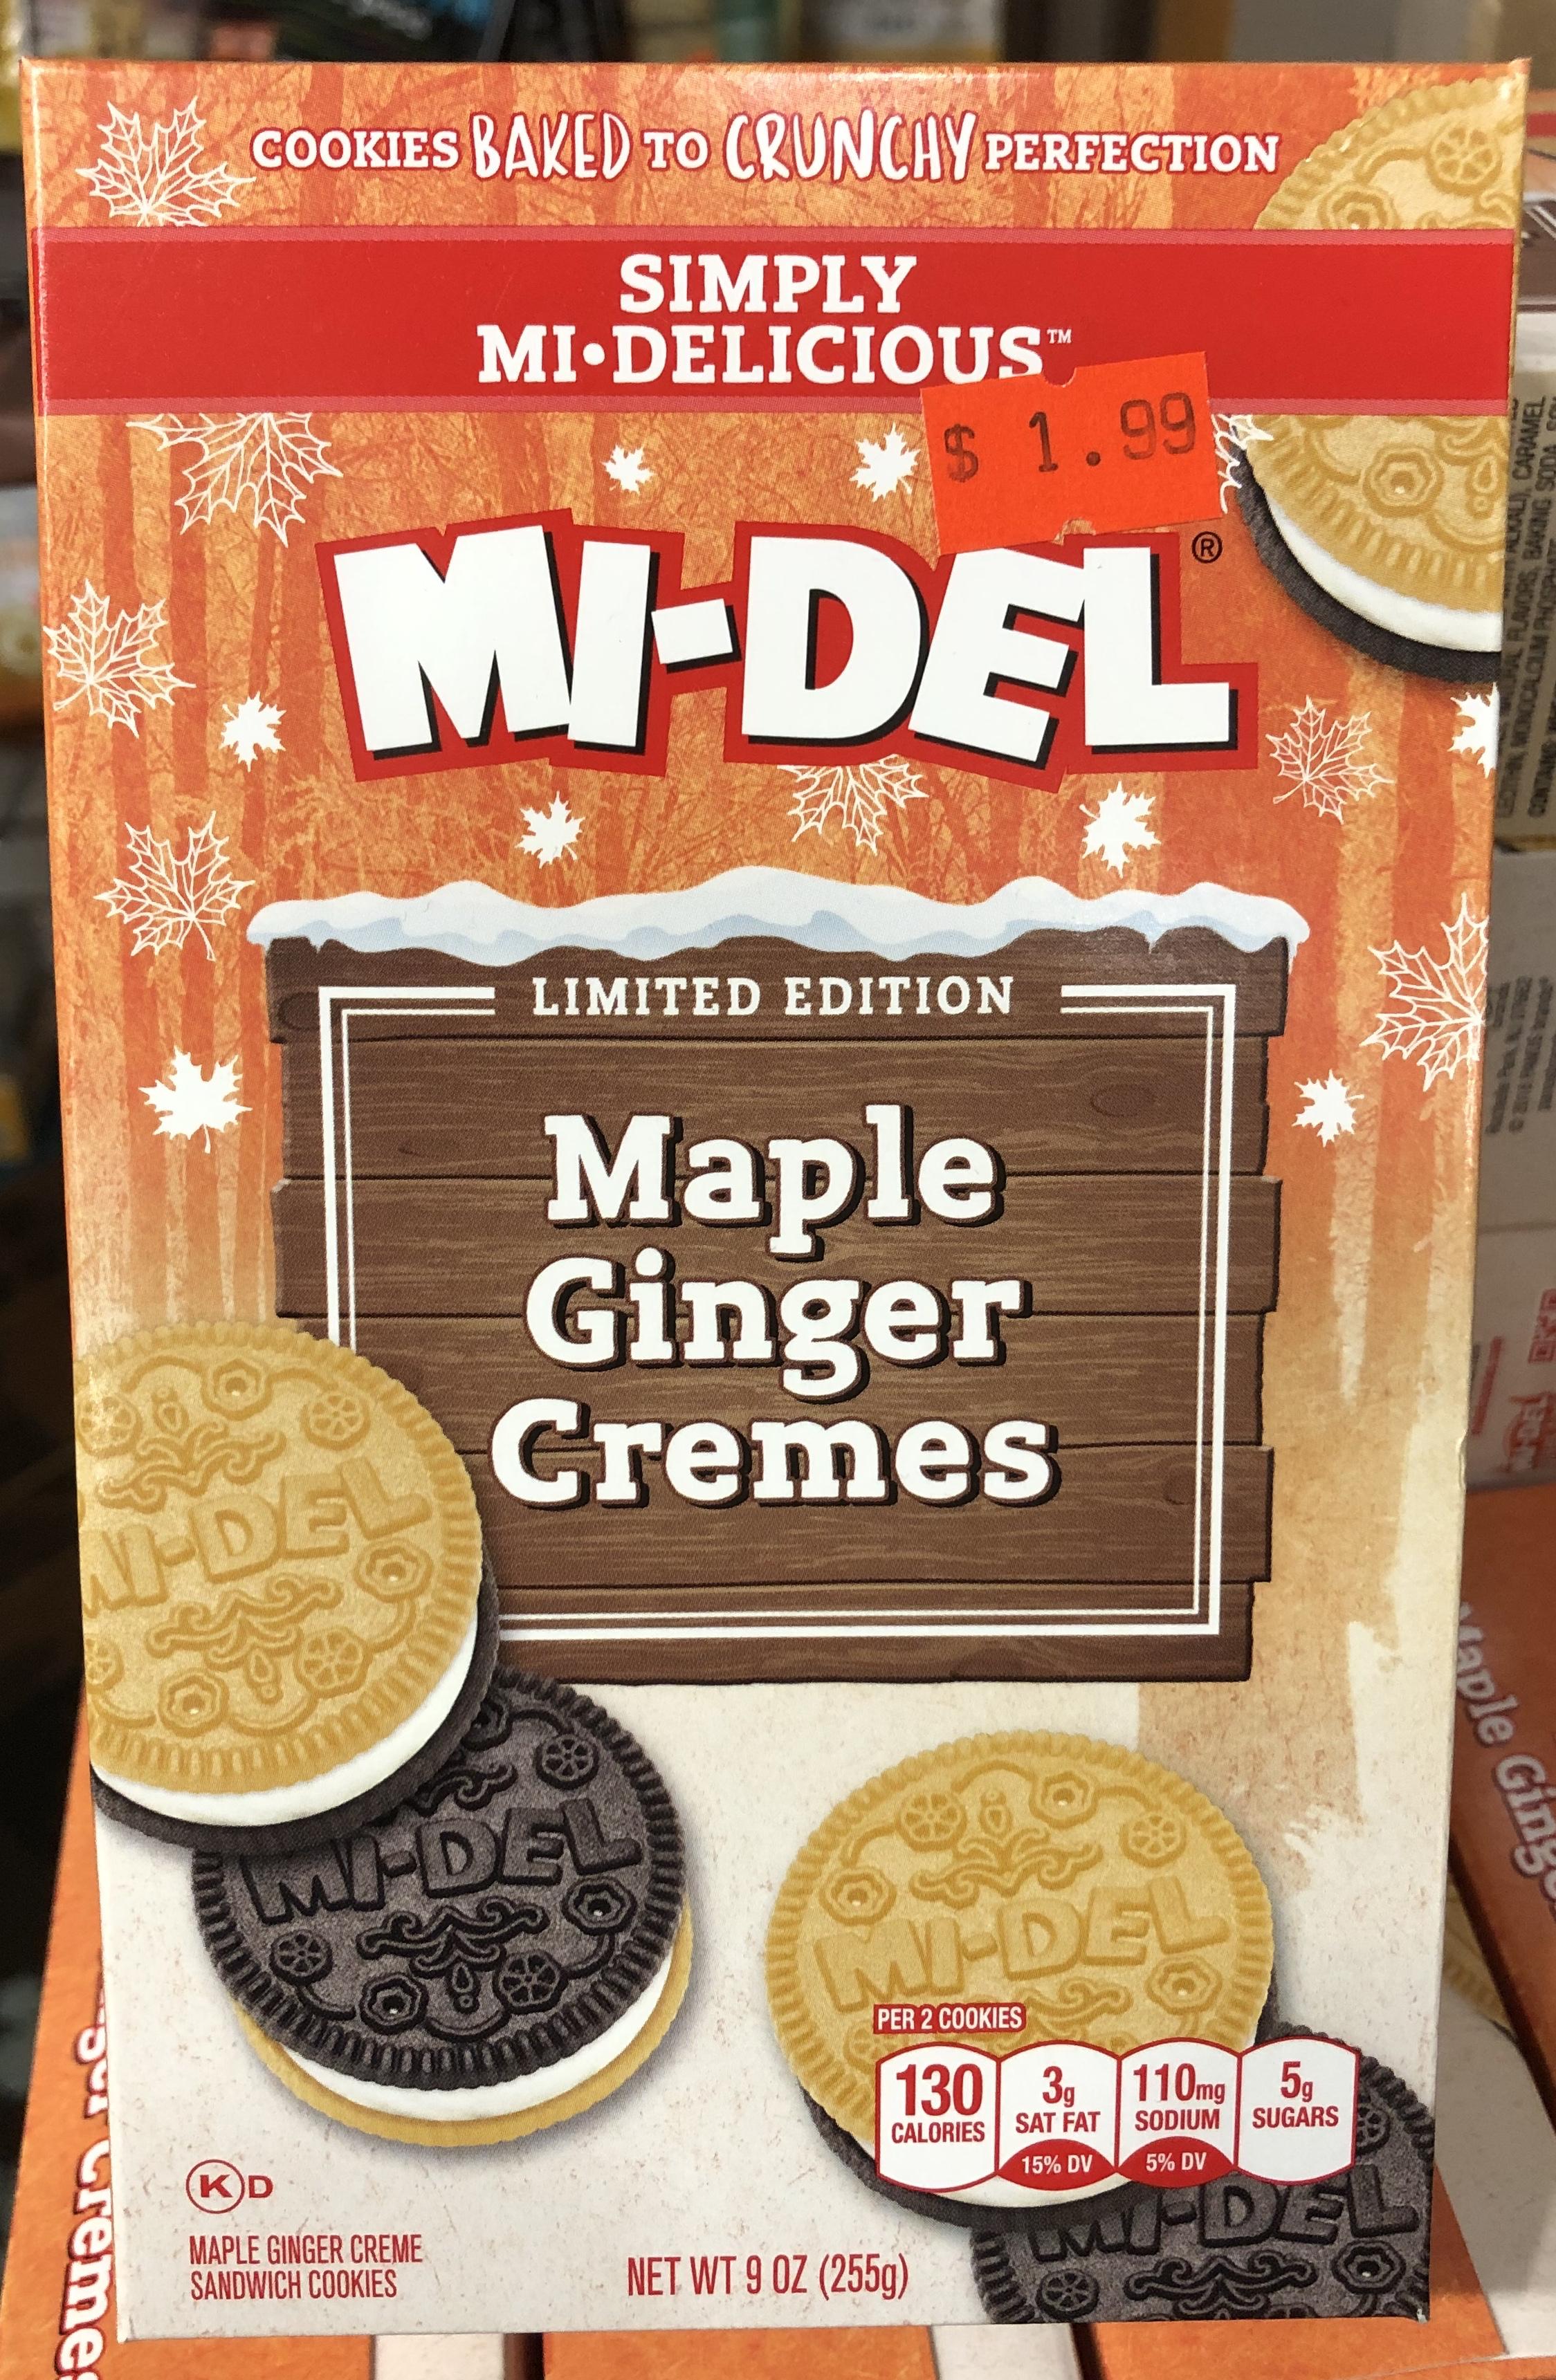 MI-DEL Maple Ginger Cremes